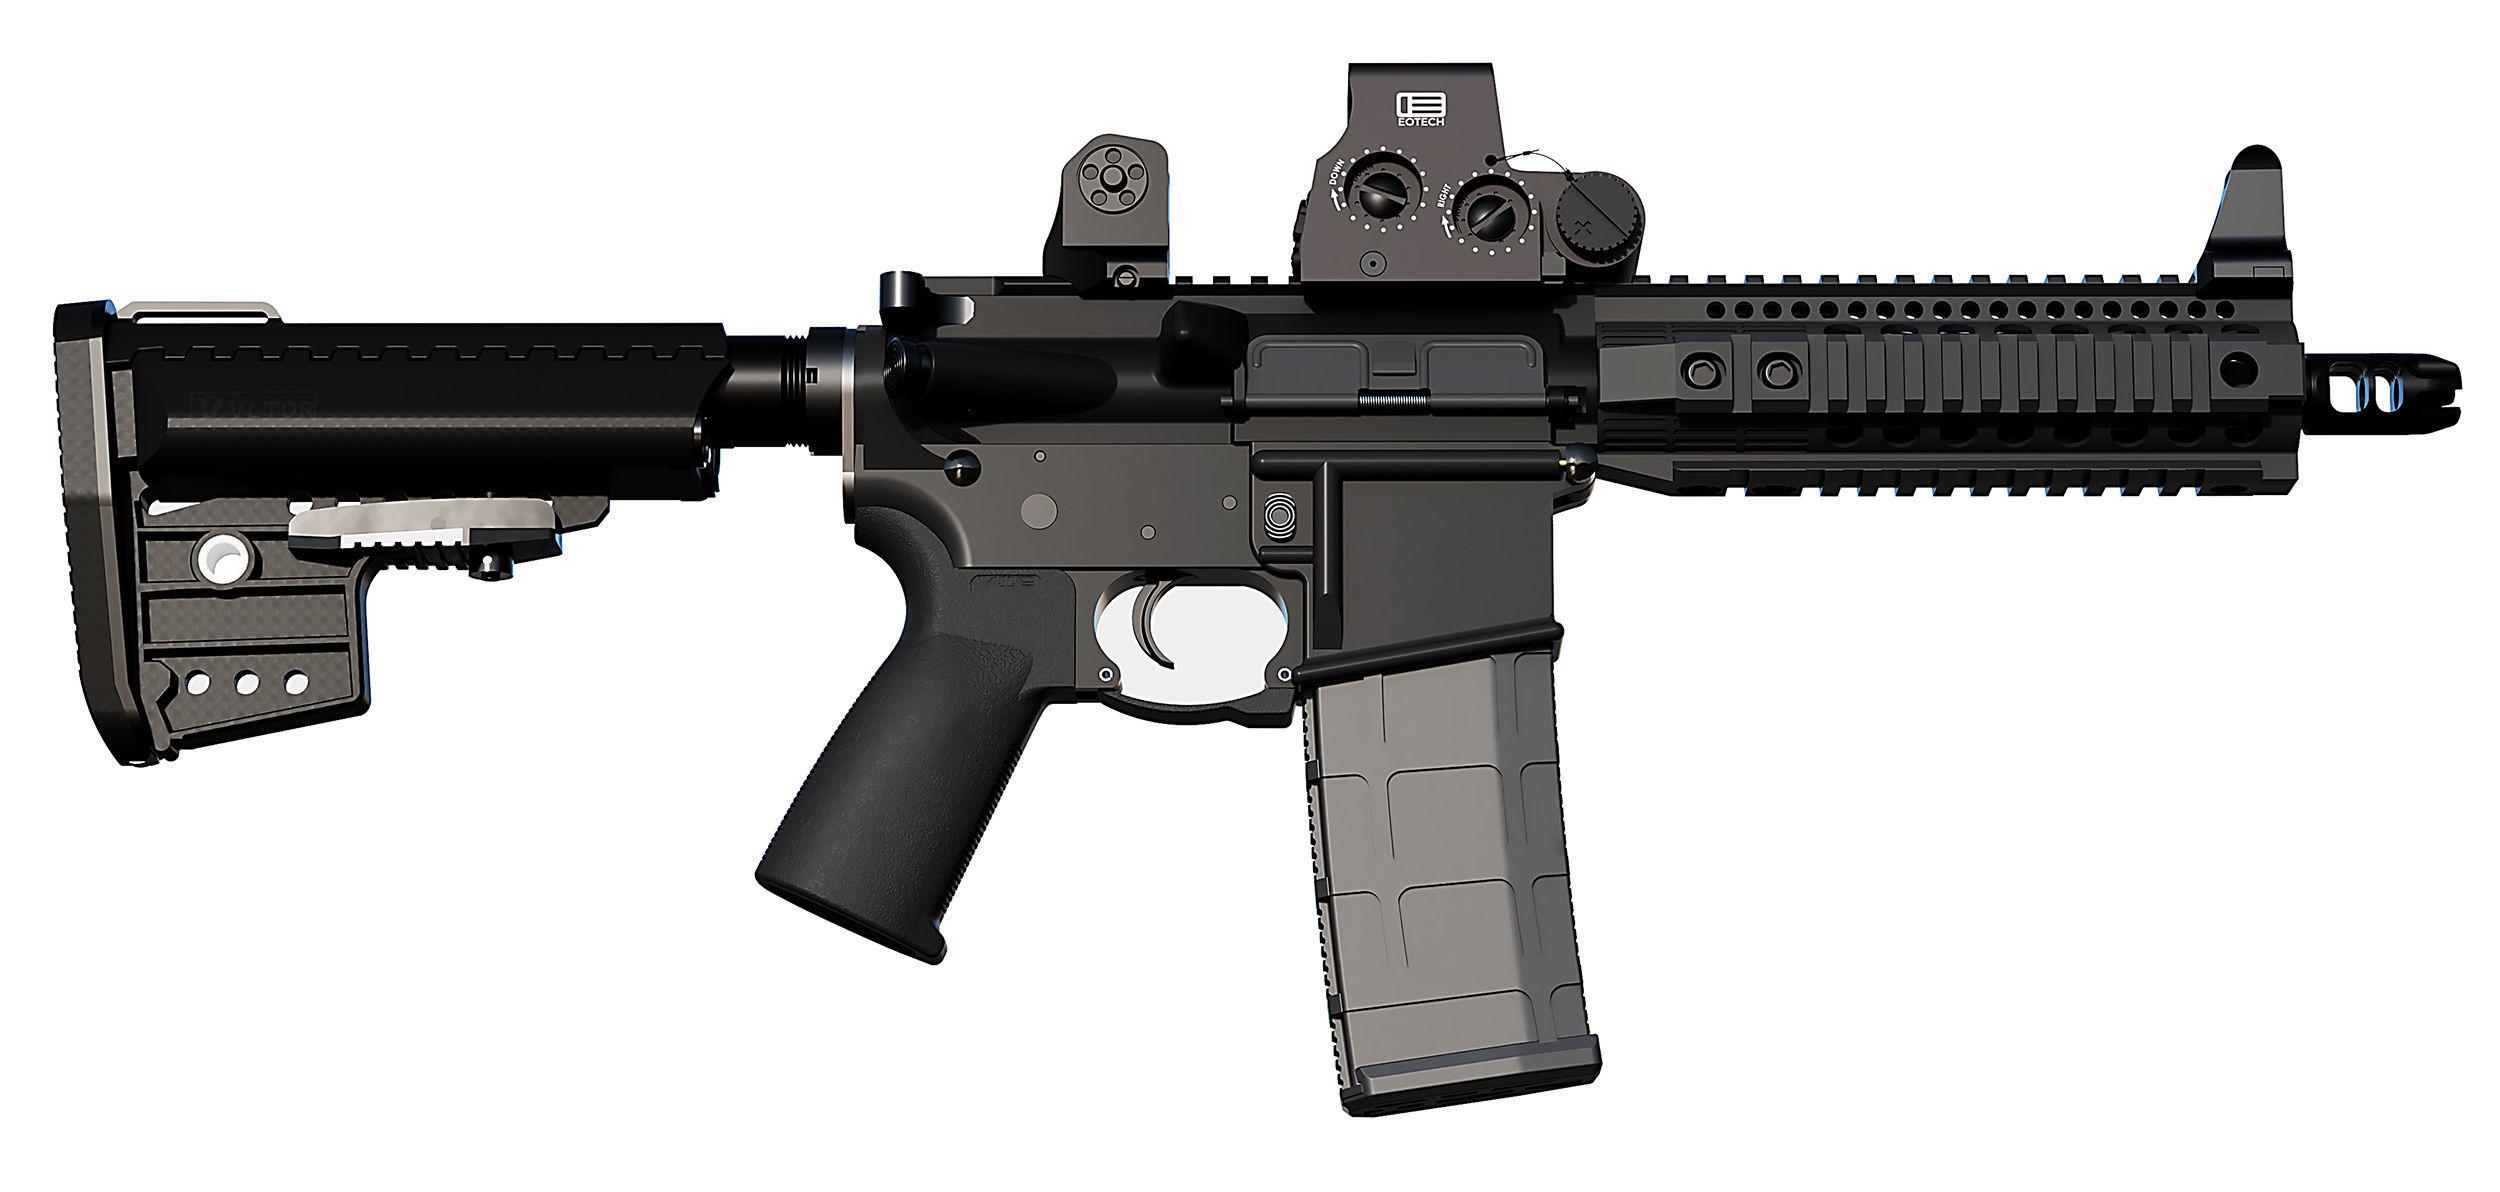 M4 M16 Selective Fire Short Barreled Rifle